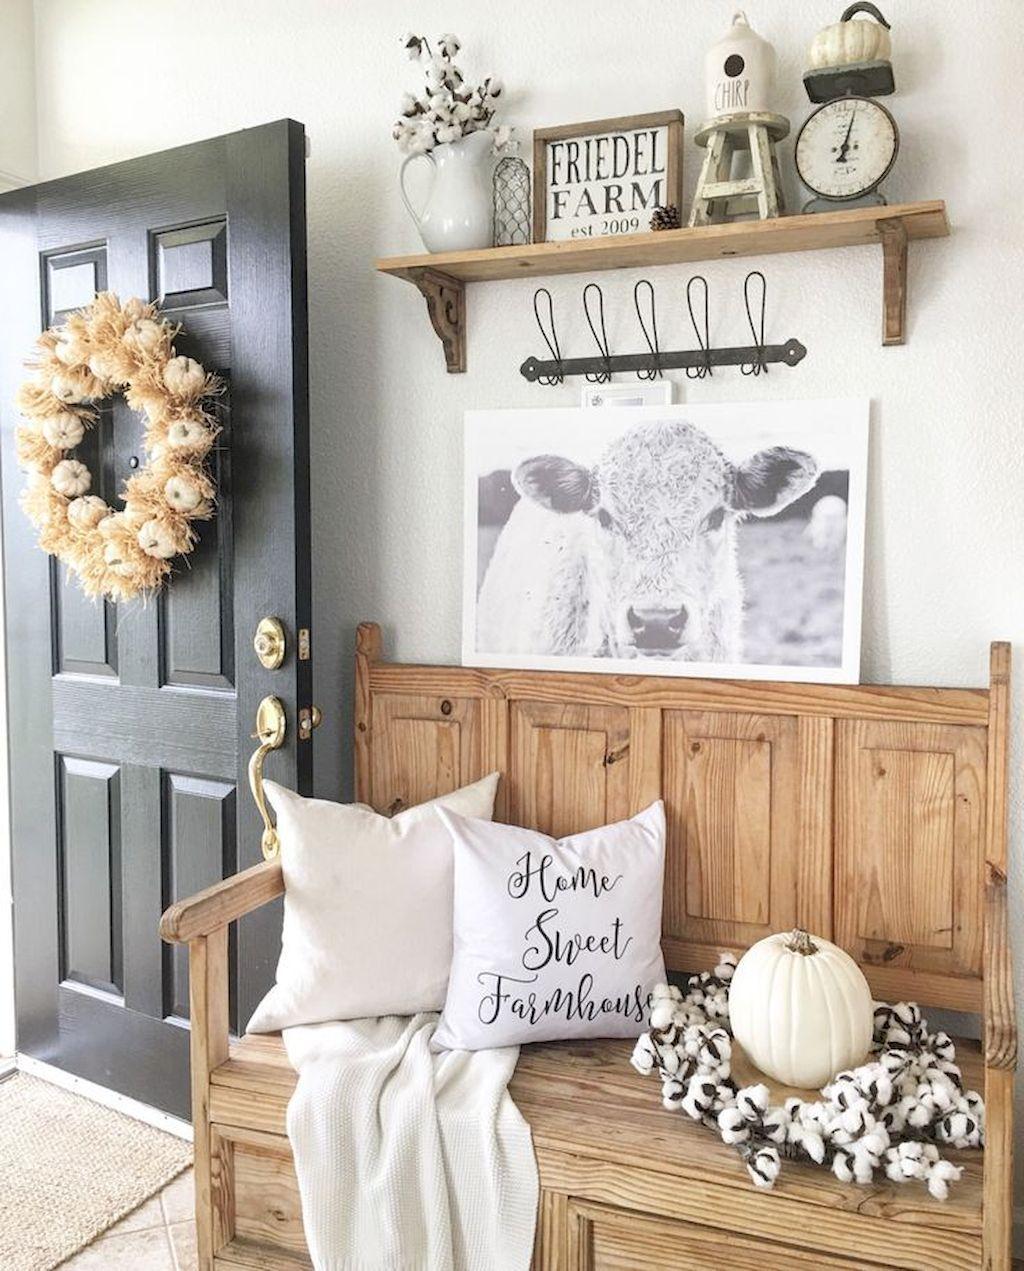 50 Stunning Rustic Entryway Decor Ideas